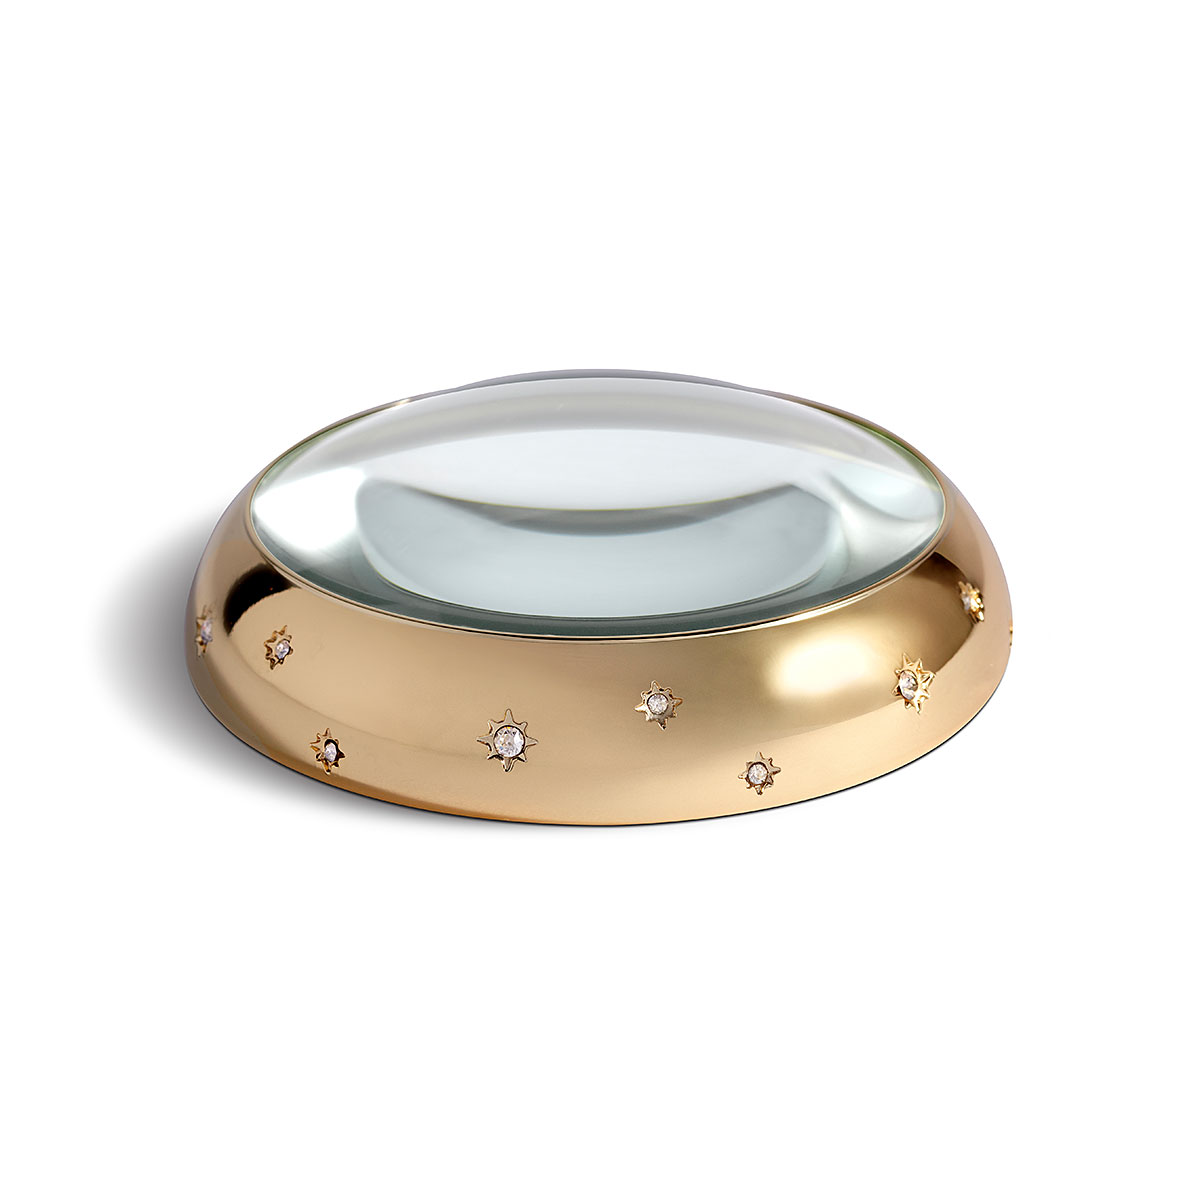 L'Objet I Stars Magnifying Glass Gold White Crystals